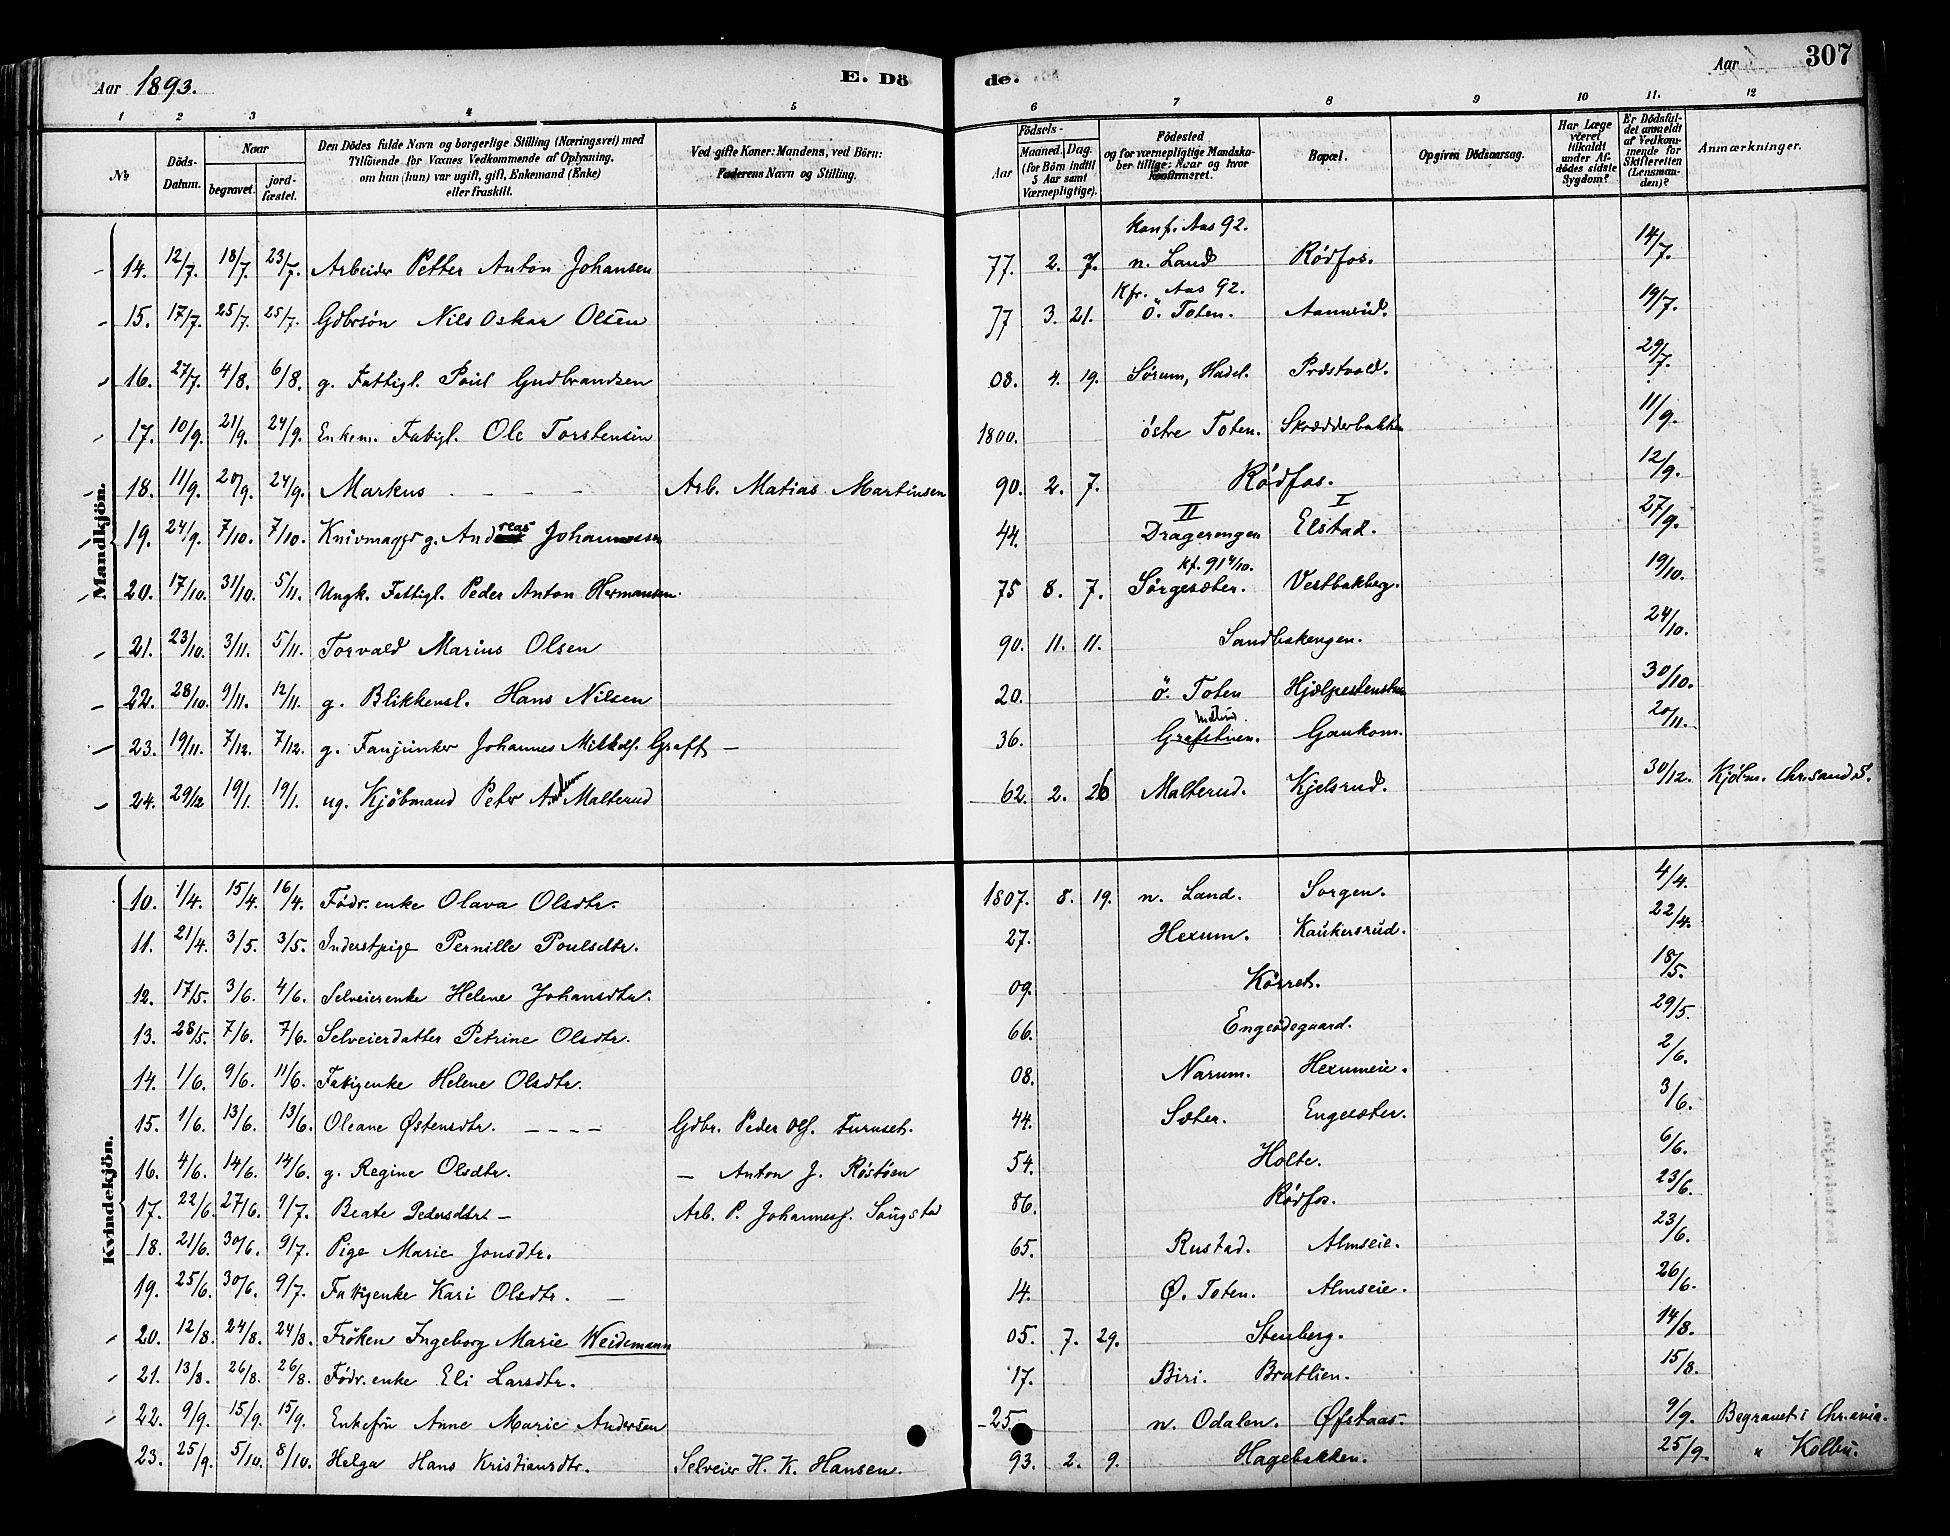 SAH, Vestre Toten prestekontor, H/Ha/Haa/L0009: Ministerialbok nr. 9, 1878-1894, s. 307